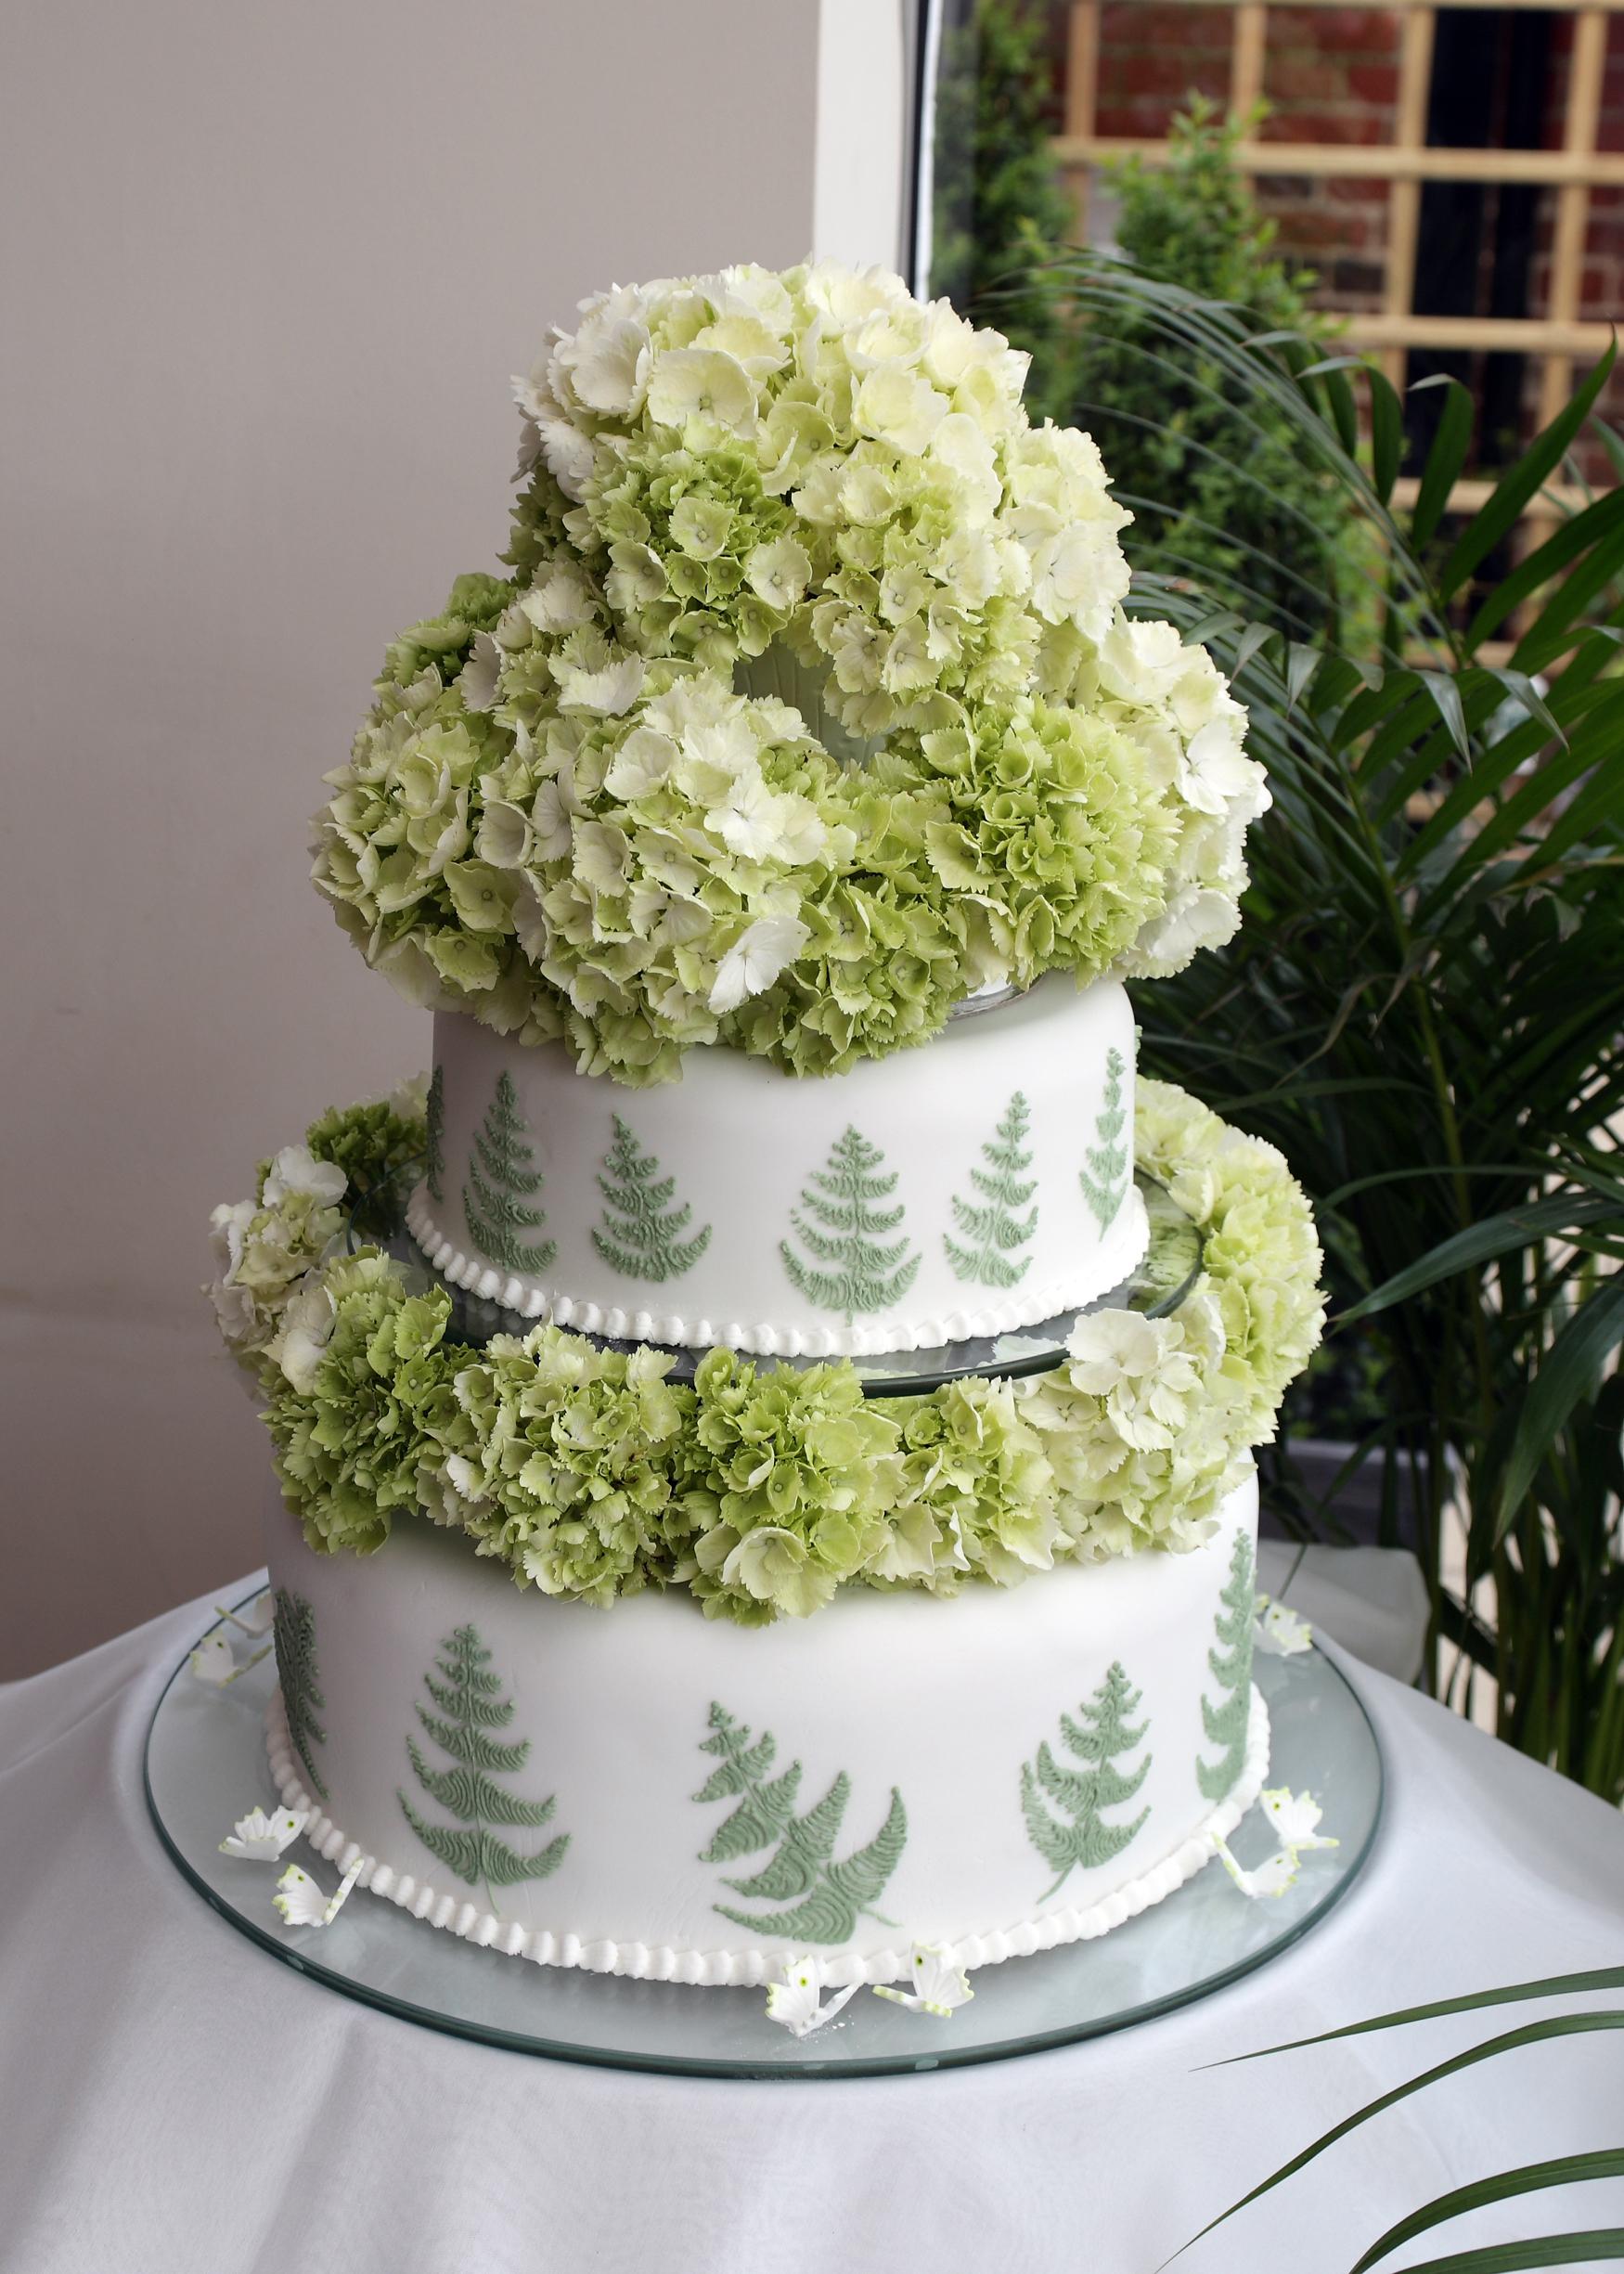 FileGreen Fern Wedding Cake